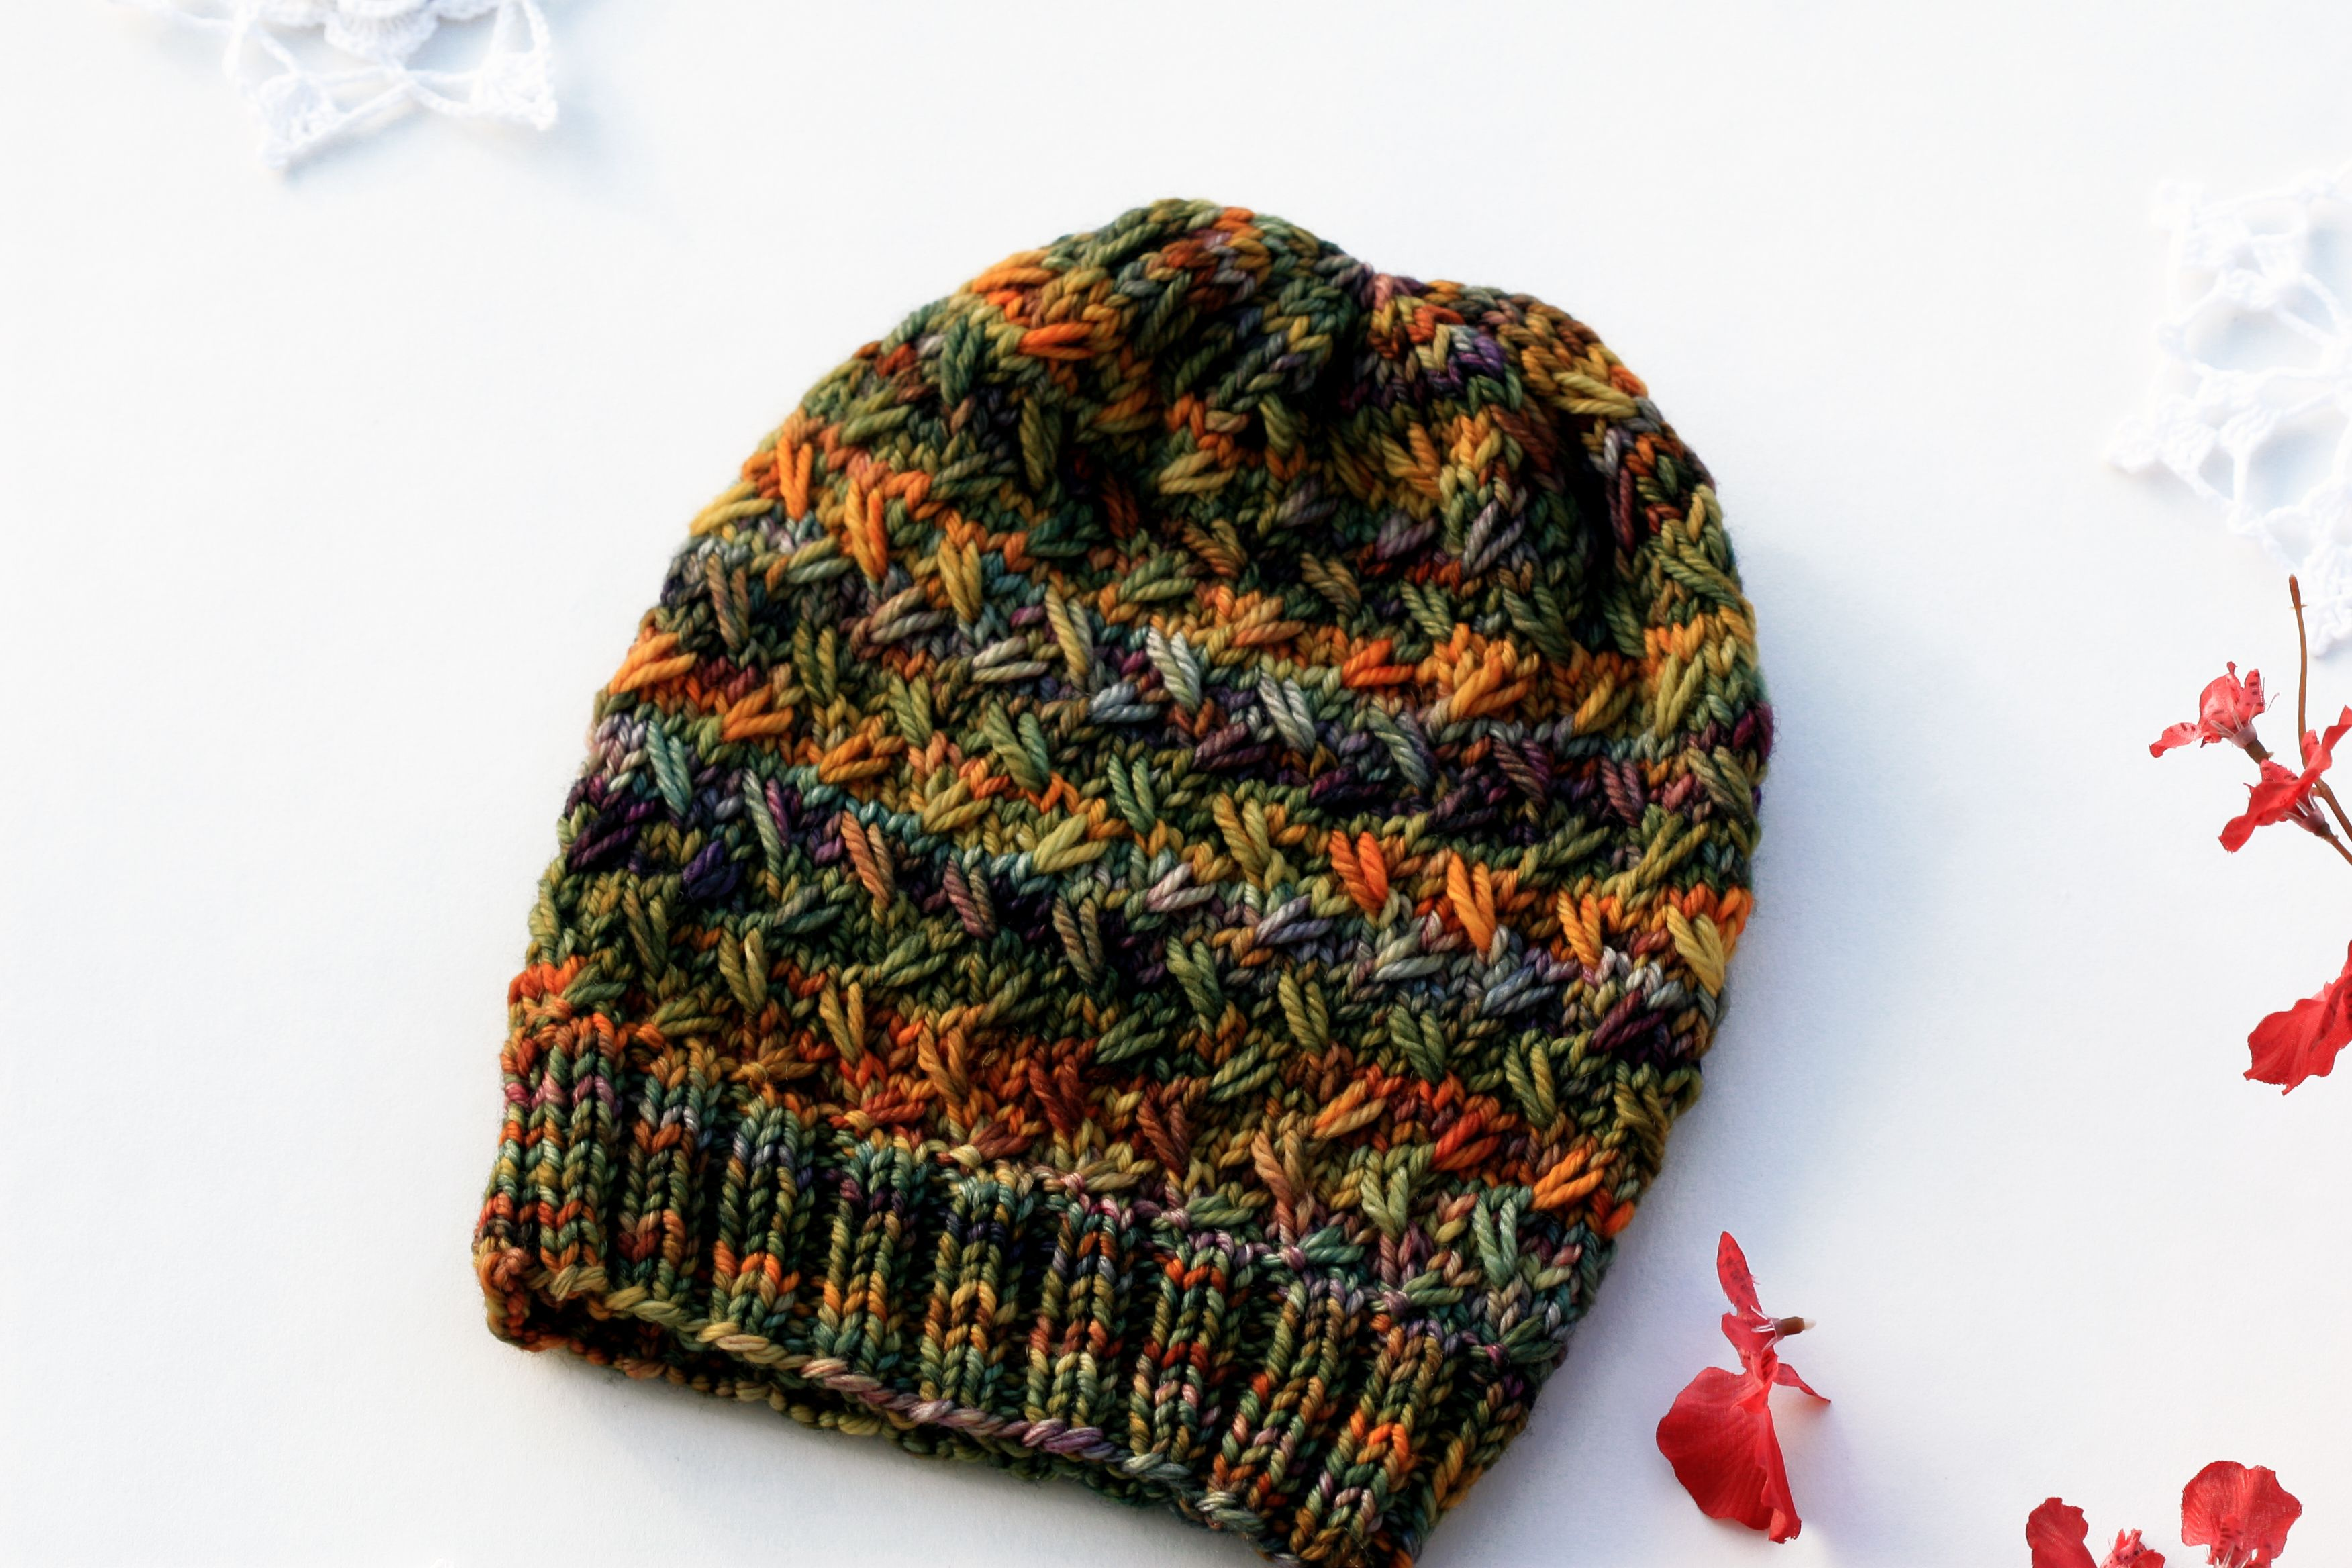 Muir Woods Beanie Pattern | Bags & Accessories | Pinterest | Beanie ...